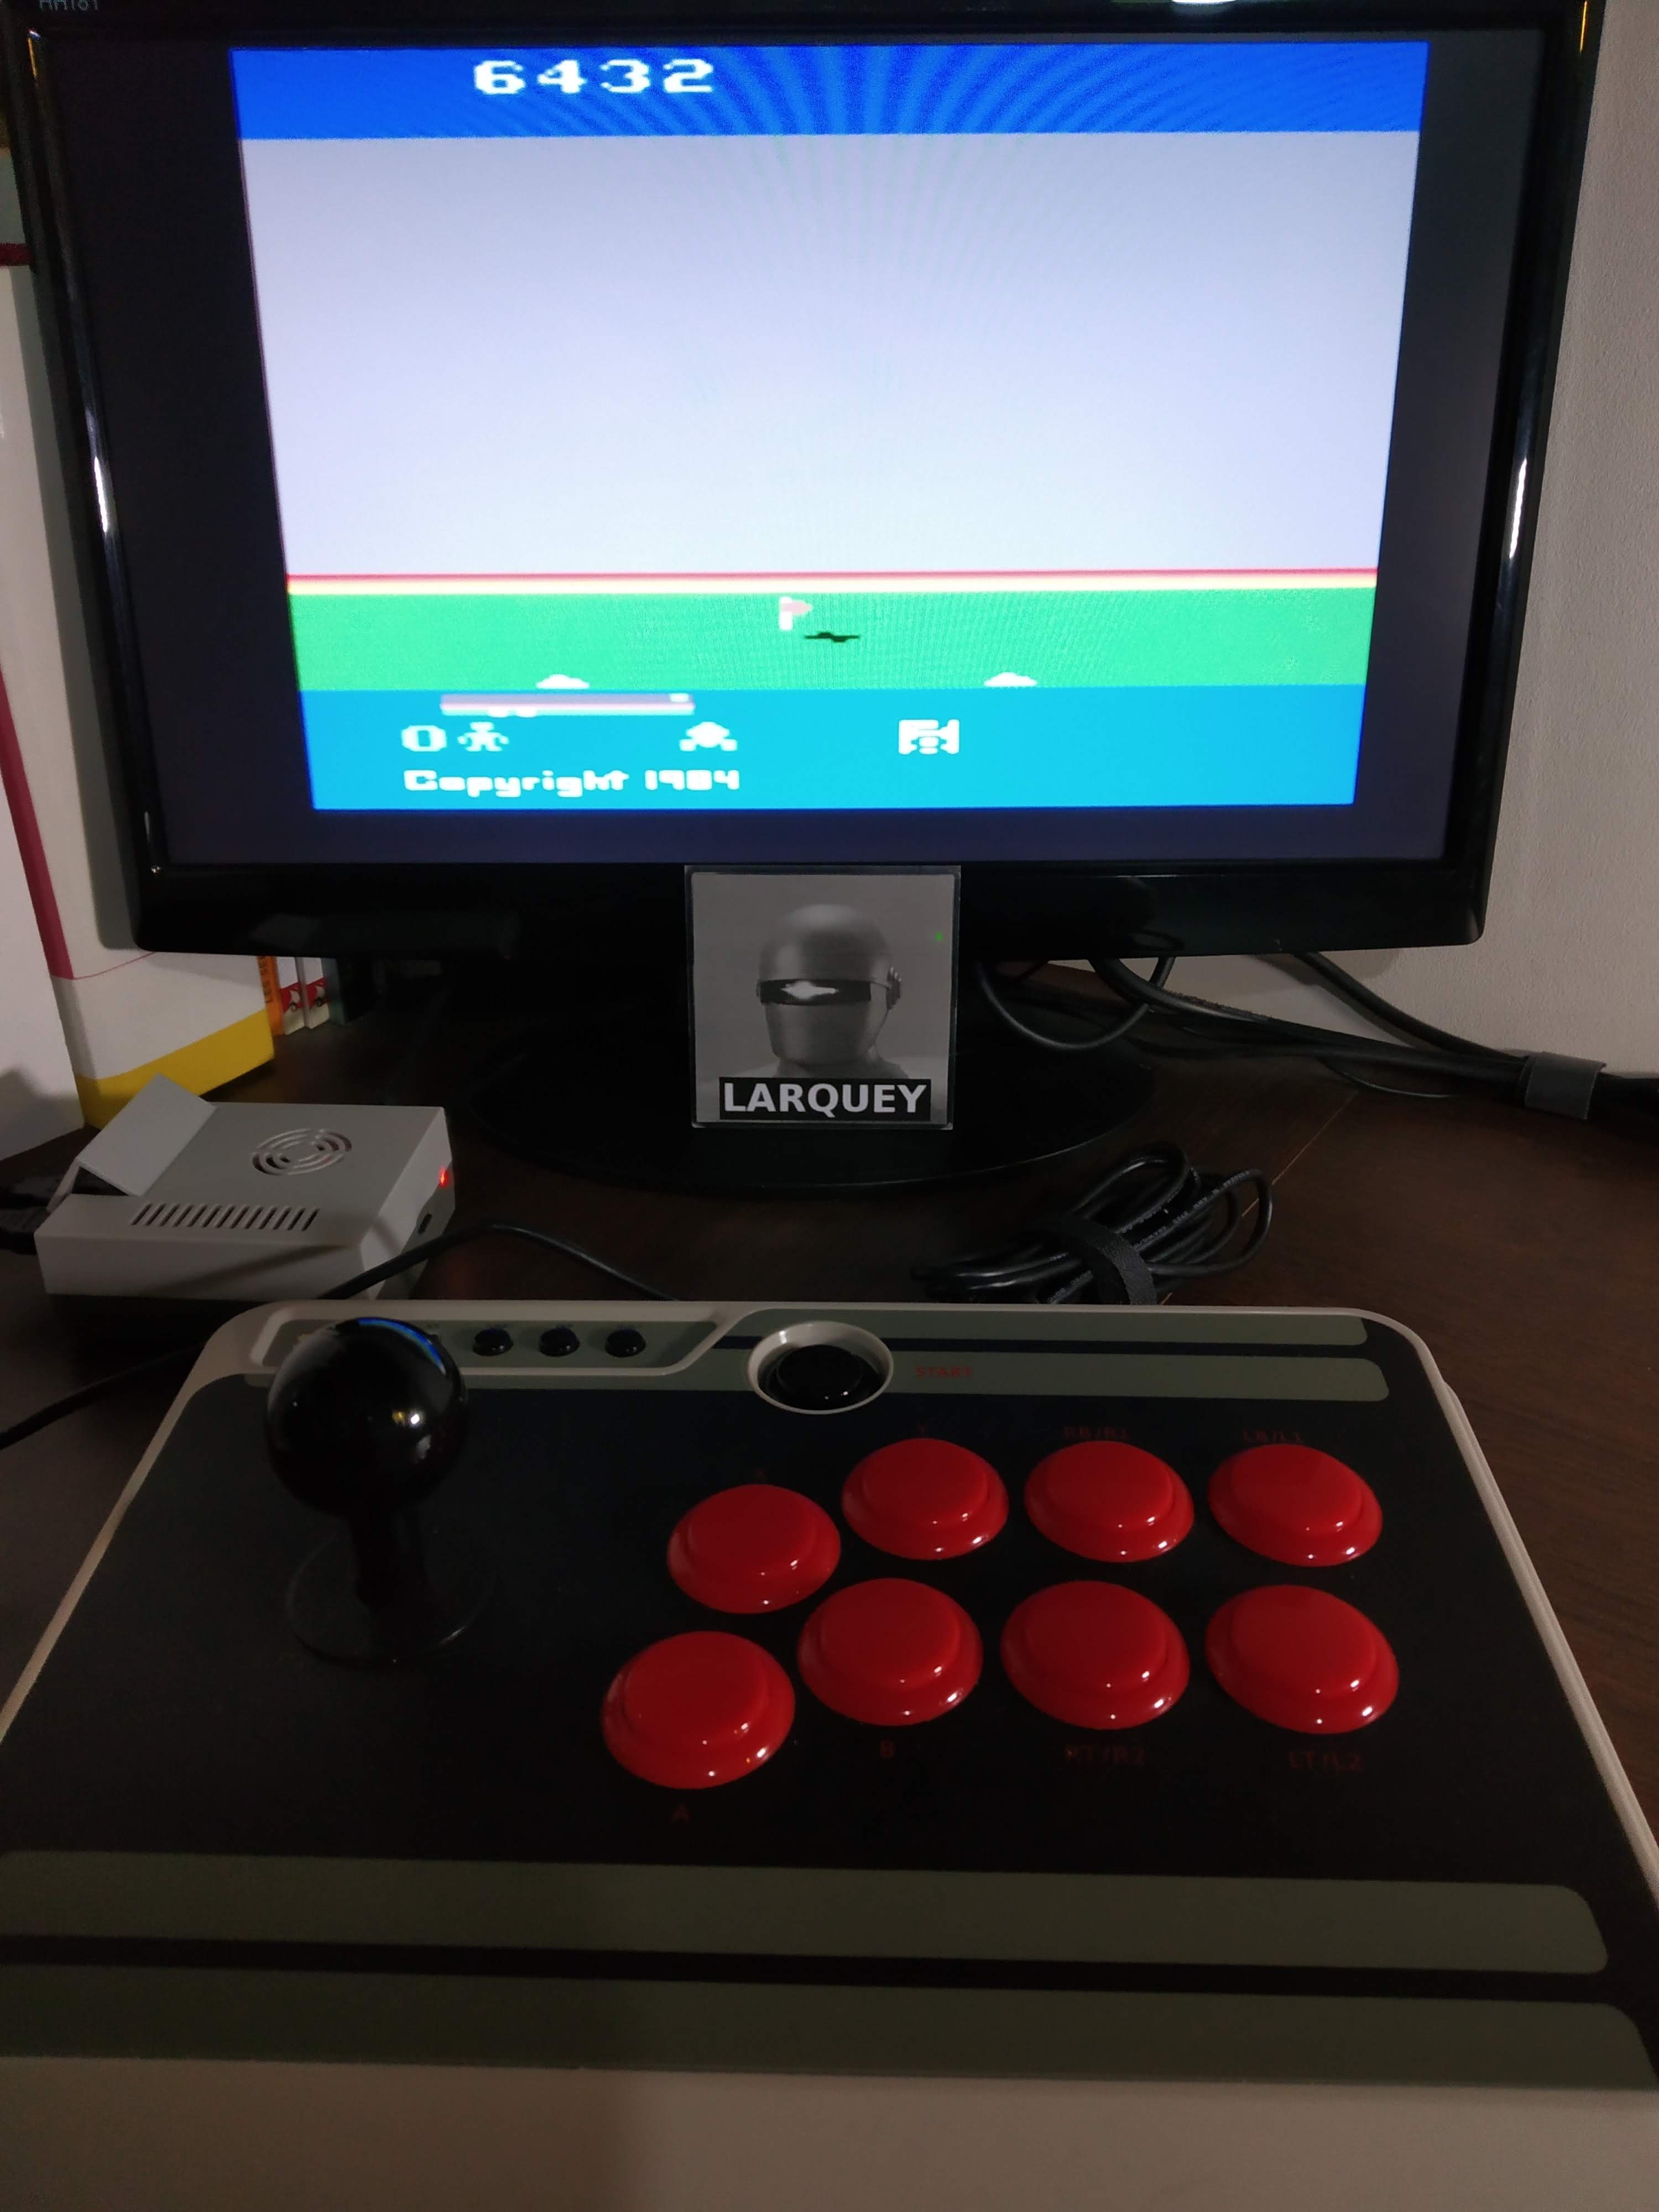 Larquey: Cosmic Commuter  (Atari 2600 Emulated) 6,432 points on 2019-11-30 13:16:48